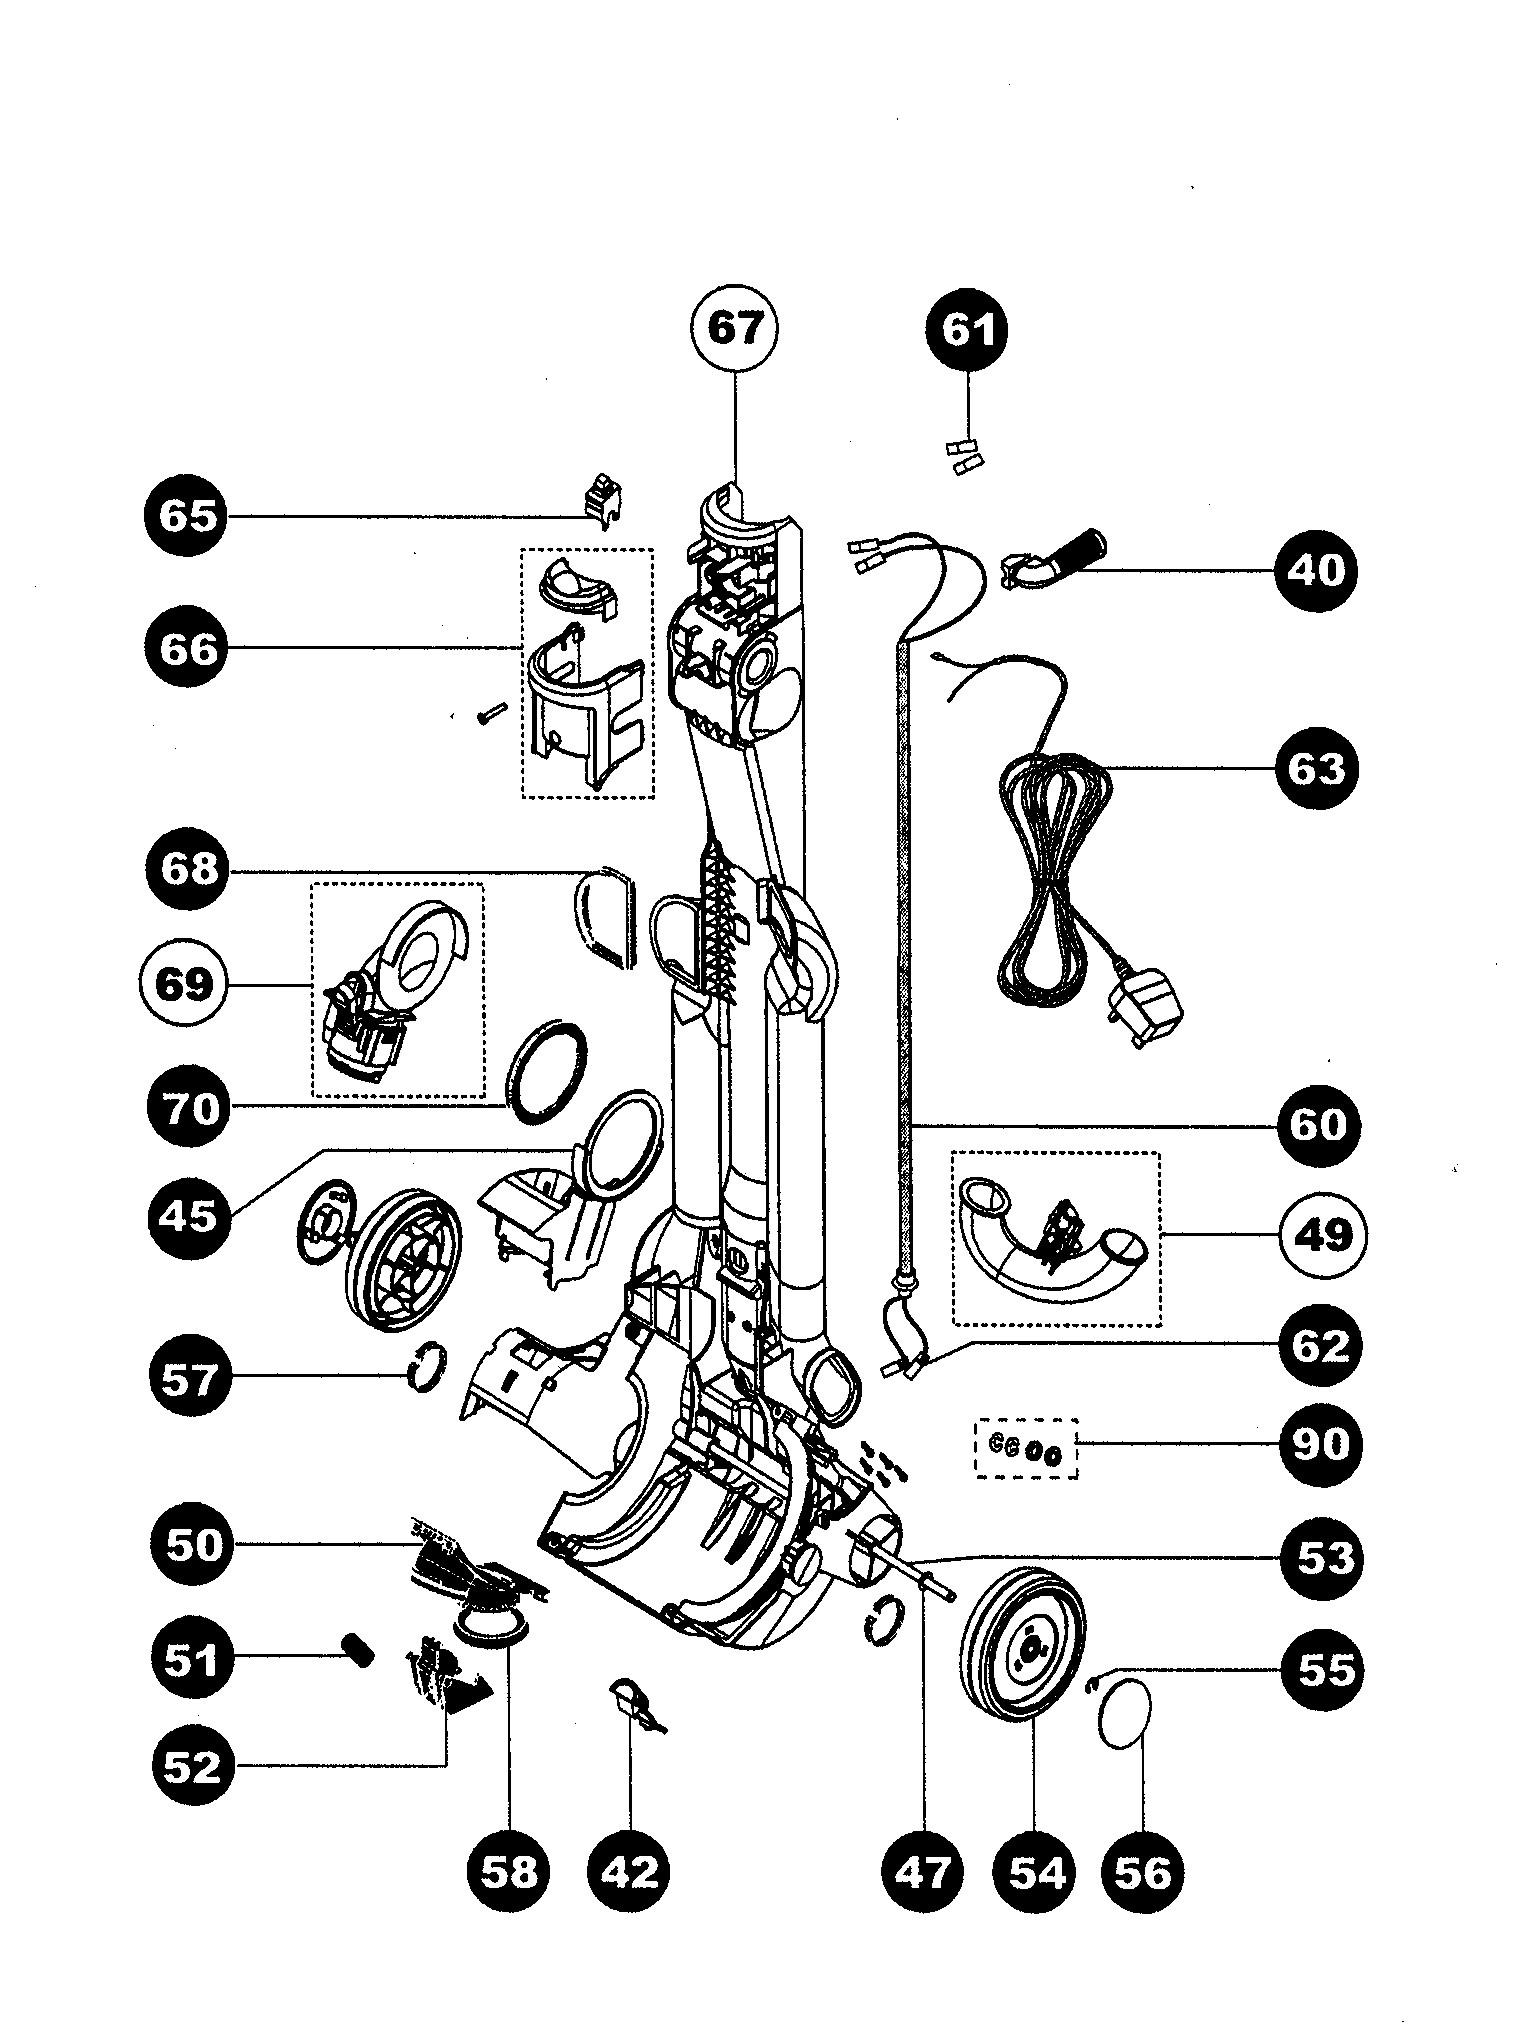 Dyson Animal Parts Diagram Dyson Dc07 Animal Replacement Parts Of Dyson Animal Parts Diagram